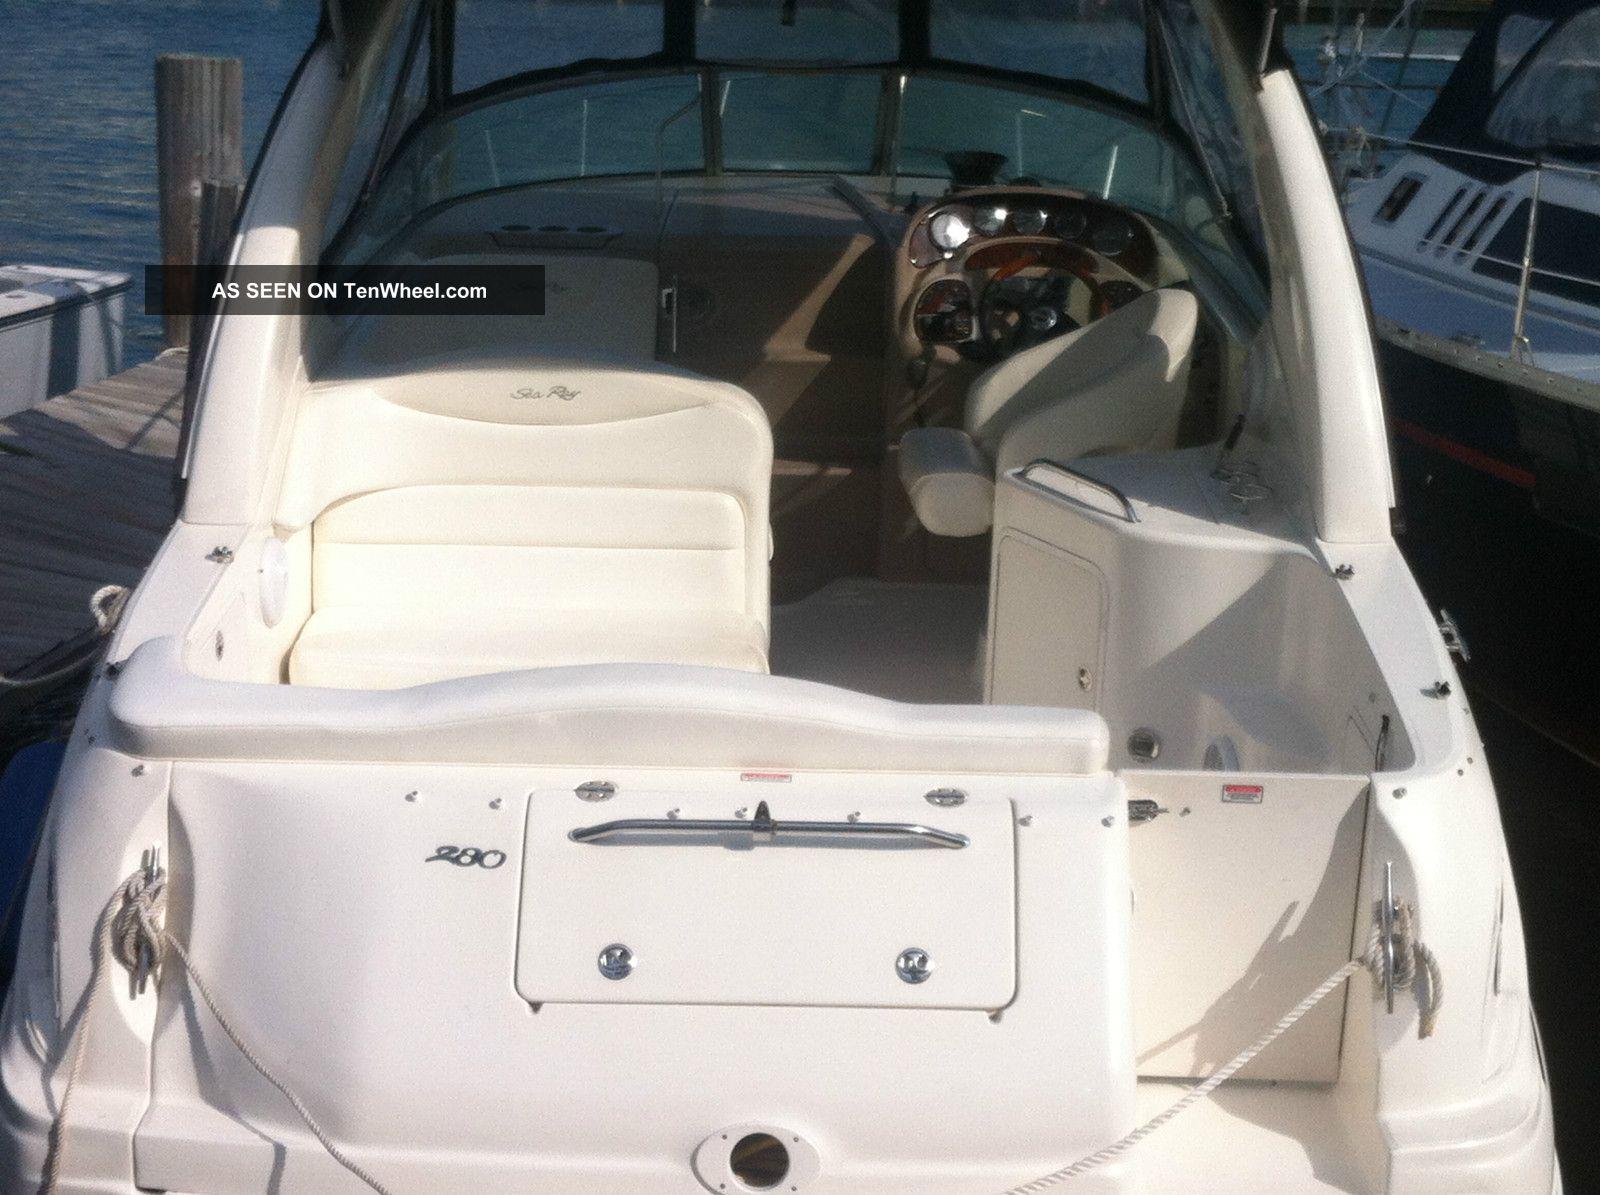 2004 Searay 280 Cruisers photo